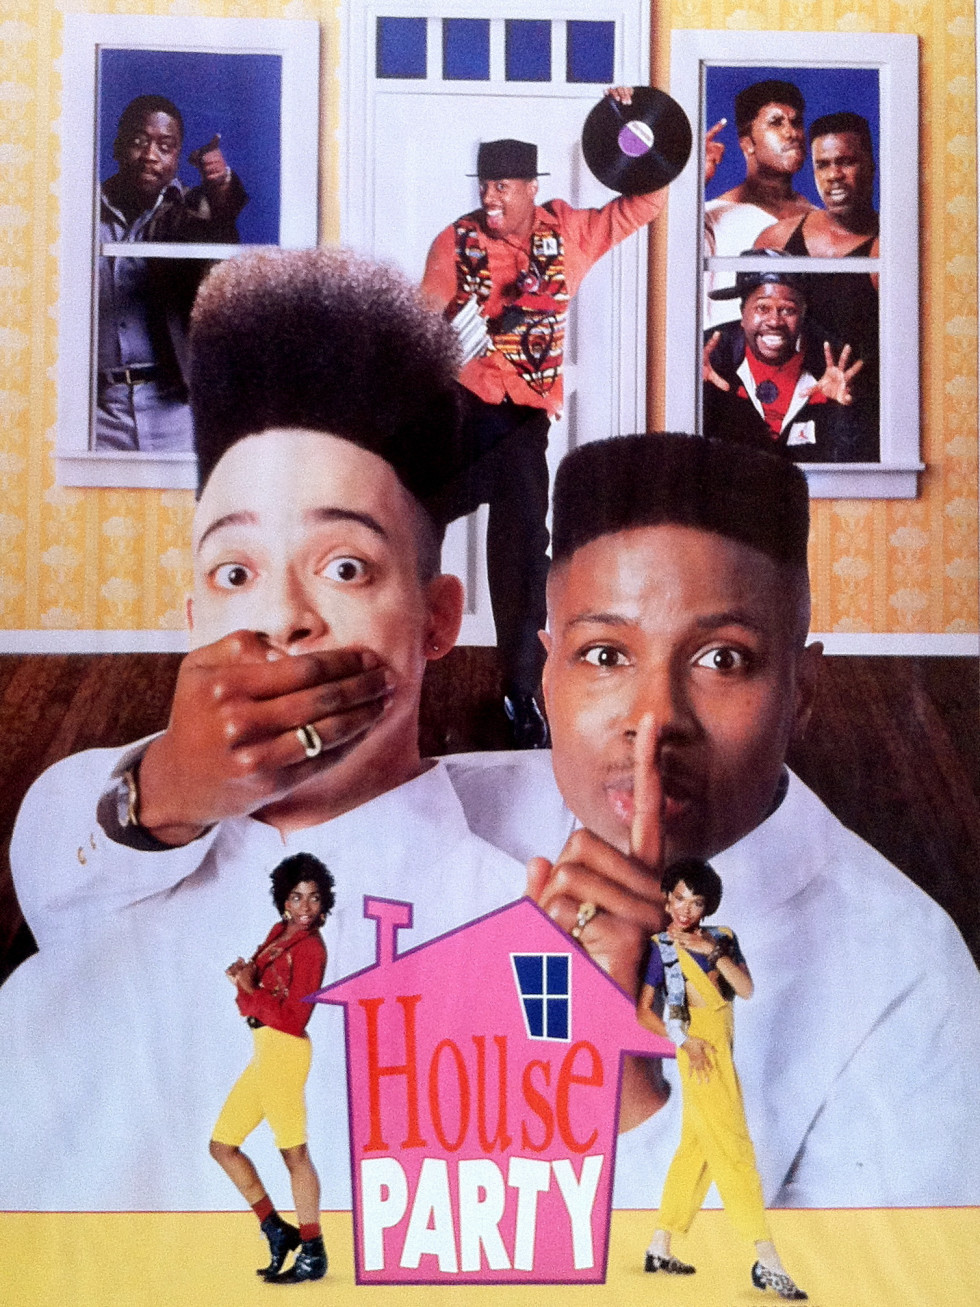 Houston, Houston Cinema Arts Fest 2015, October 2015, House Party movie poster